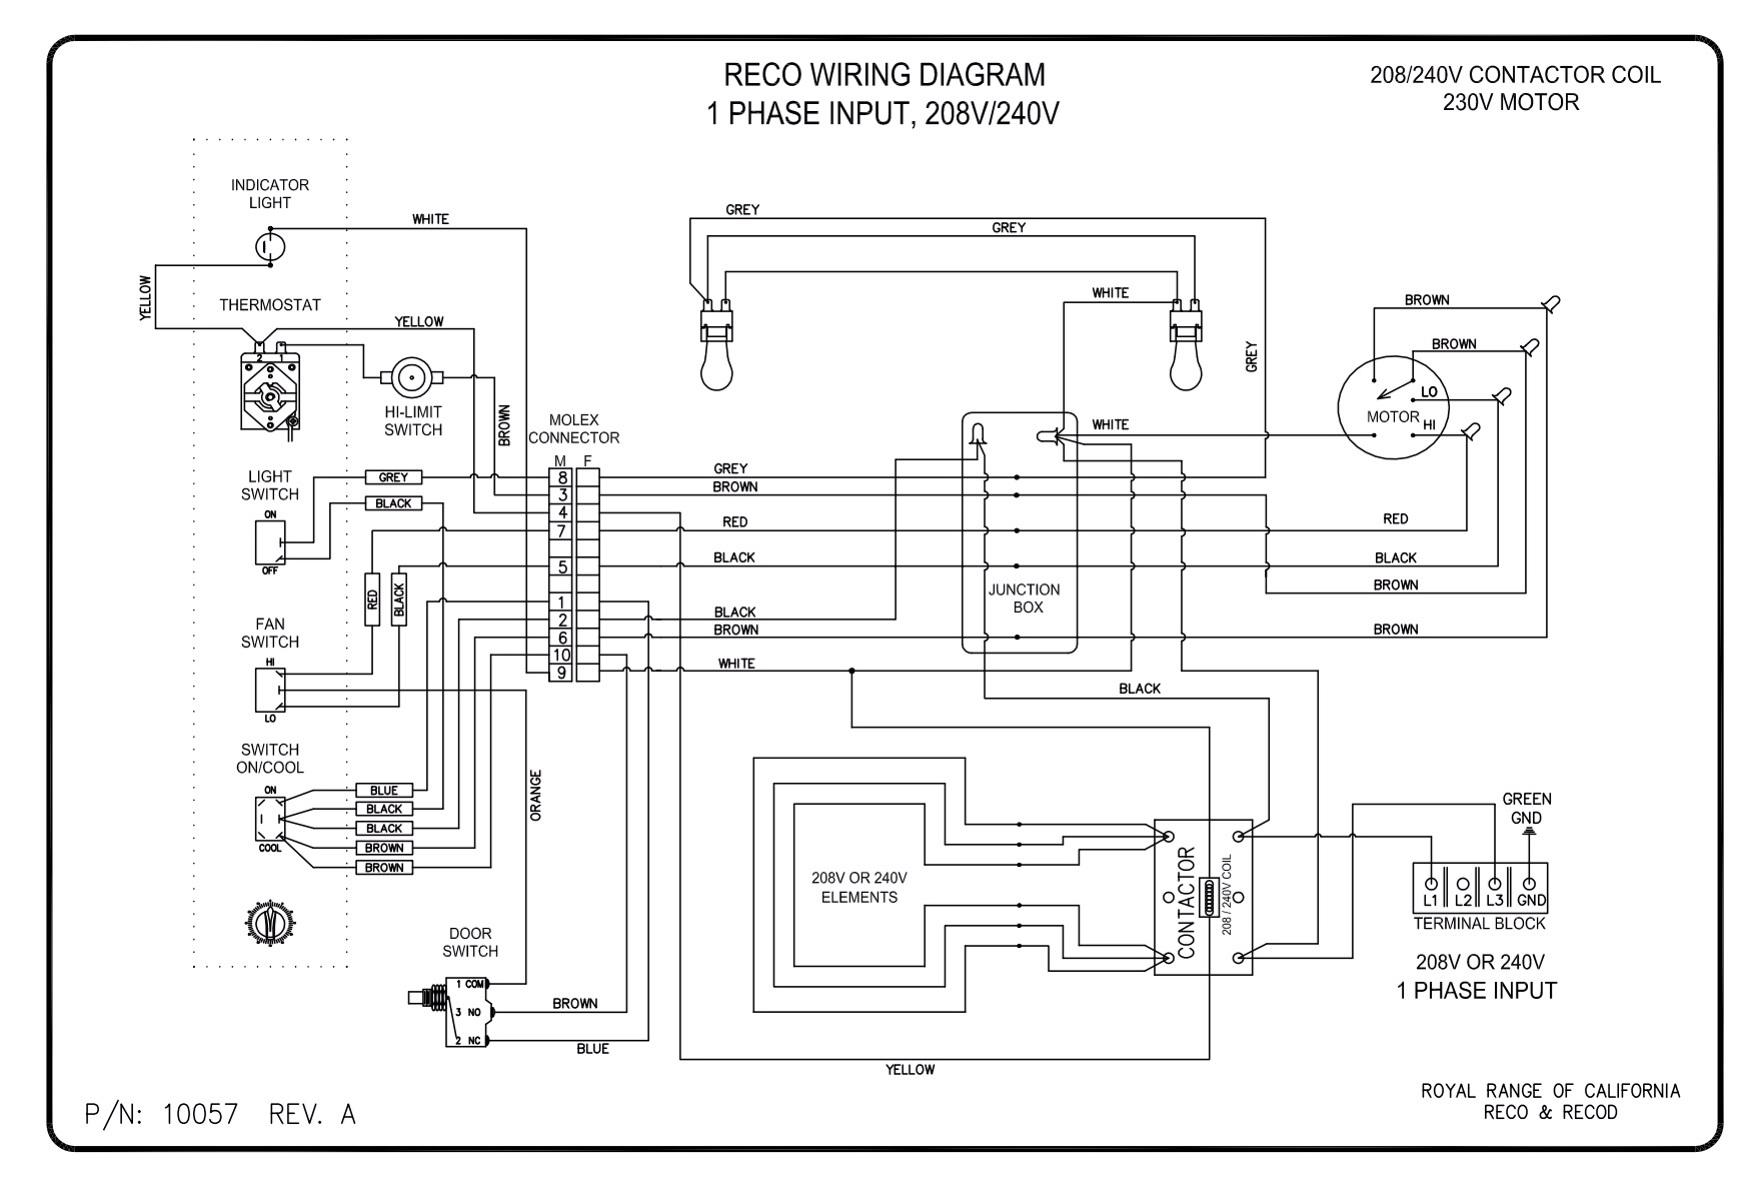 3 Phase Convection Oven Wiring Diagram Custom 220v Diagrams Royal Range Of California Rh Royalranges Com 460 220